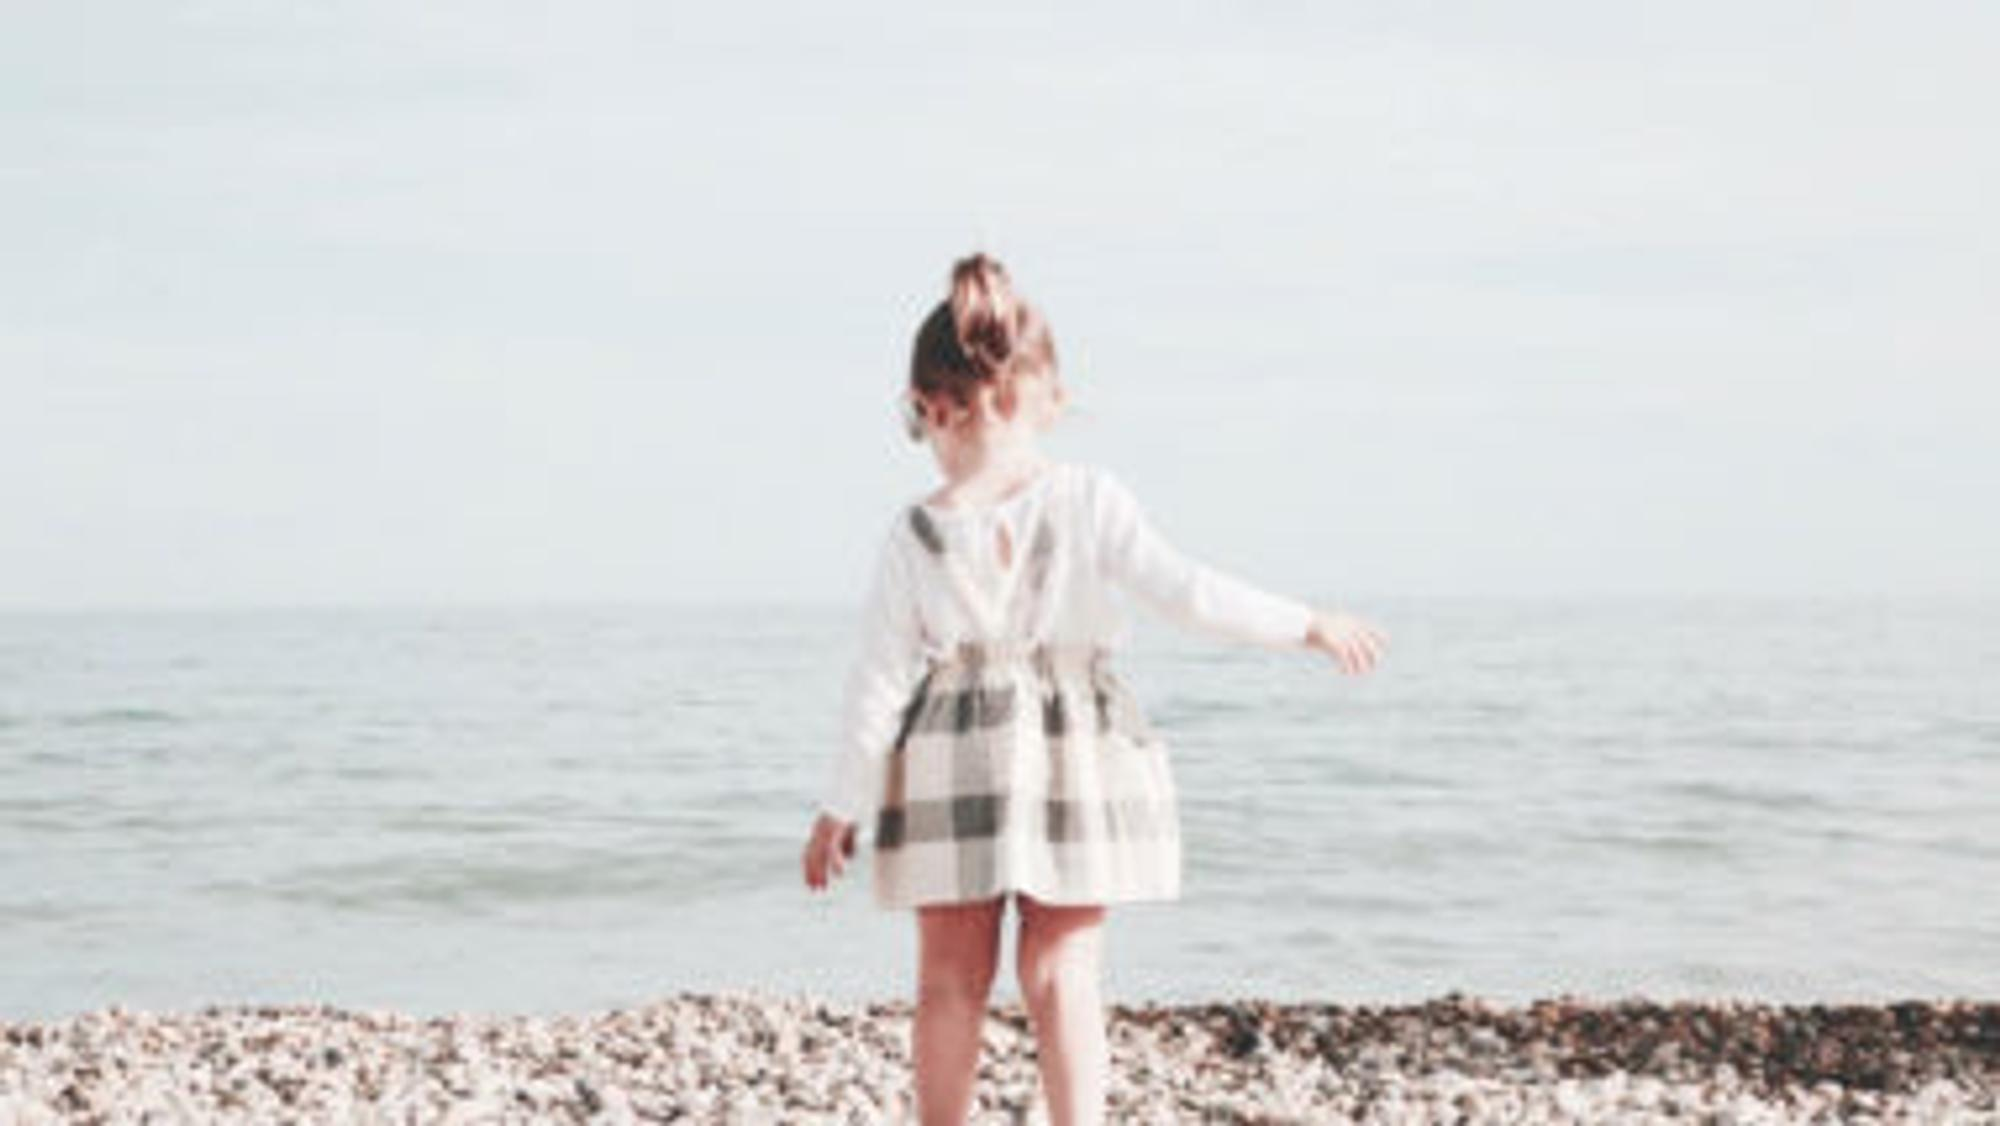 Mädchen läuft am Strand entlang